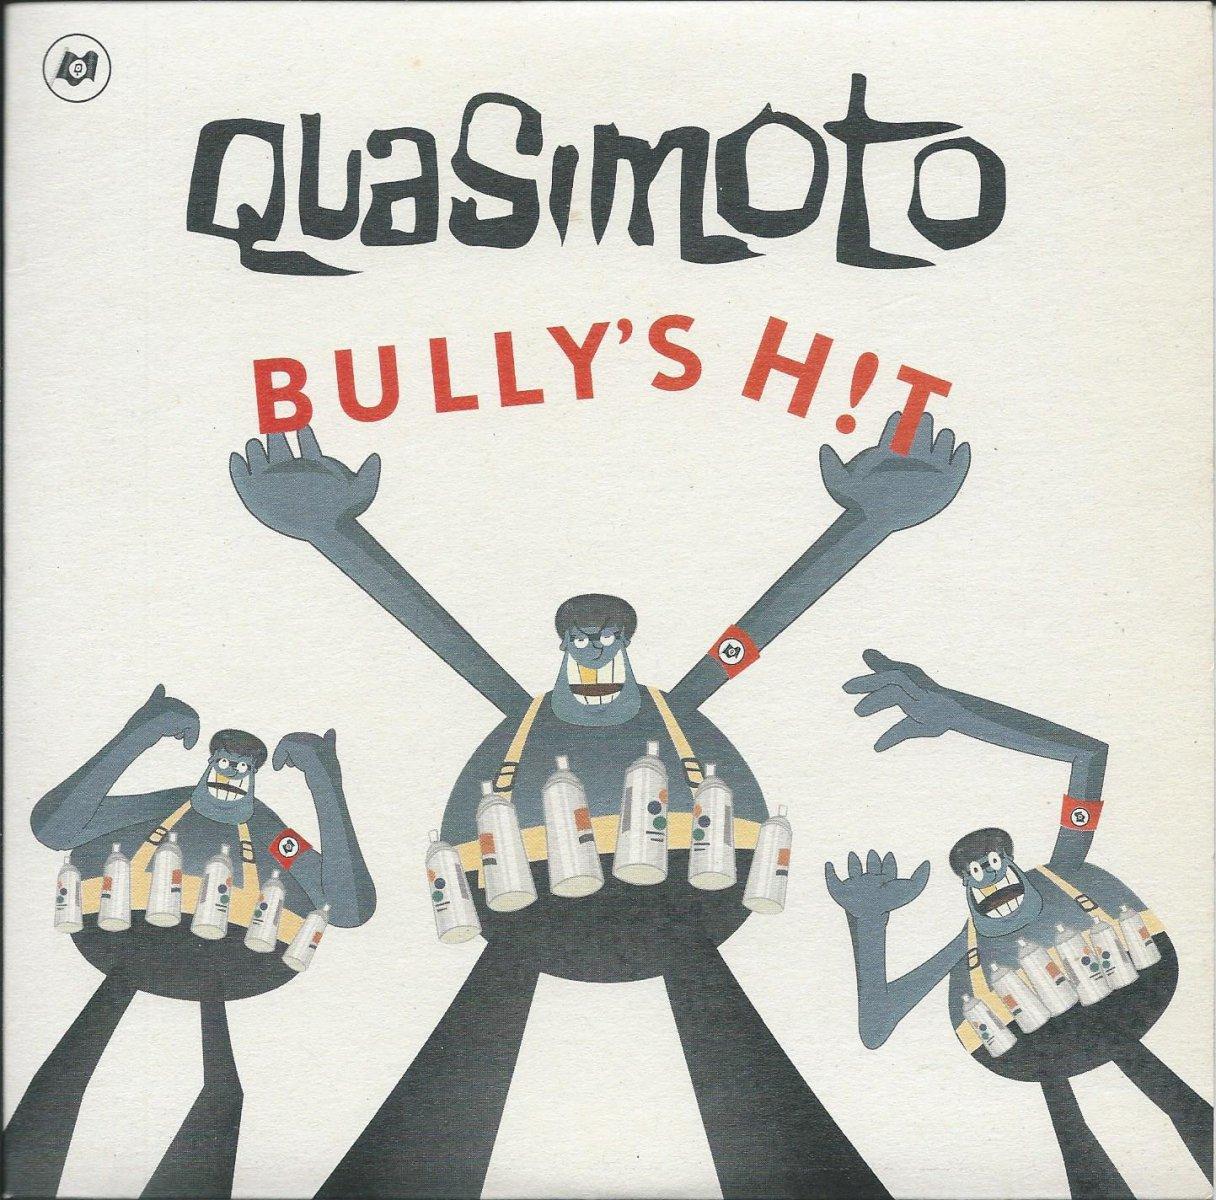 QUASIMOTO / BULLY'S H!T / SEASONS CHANGE (7